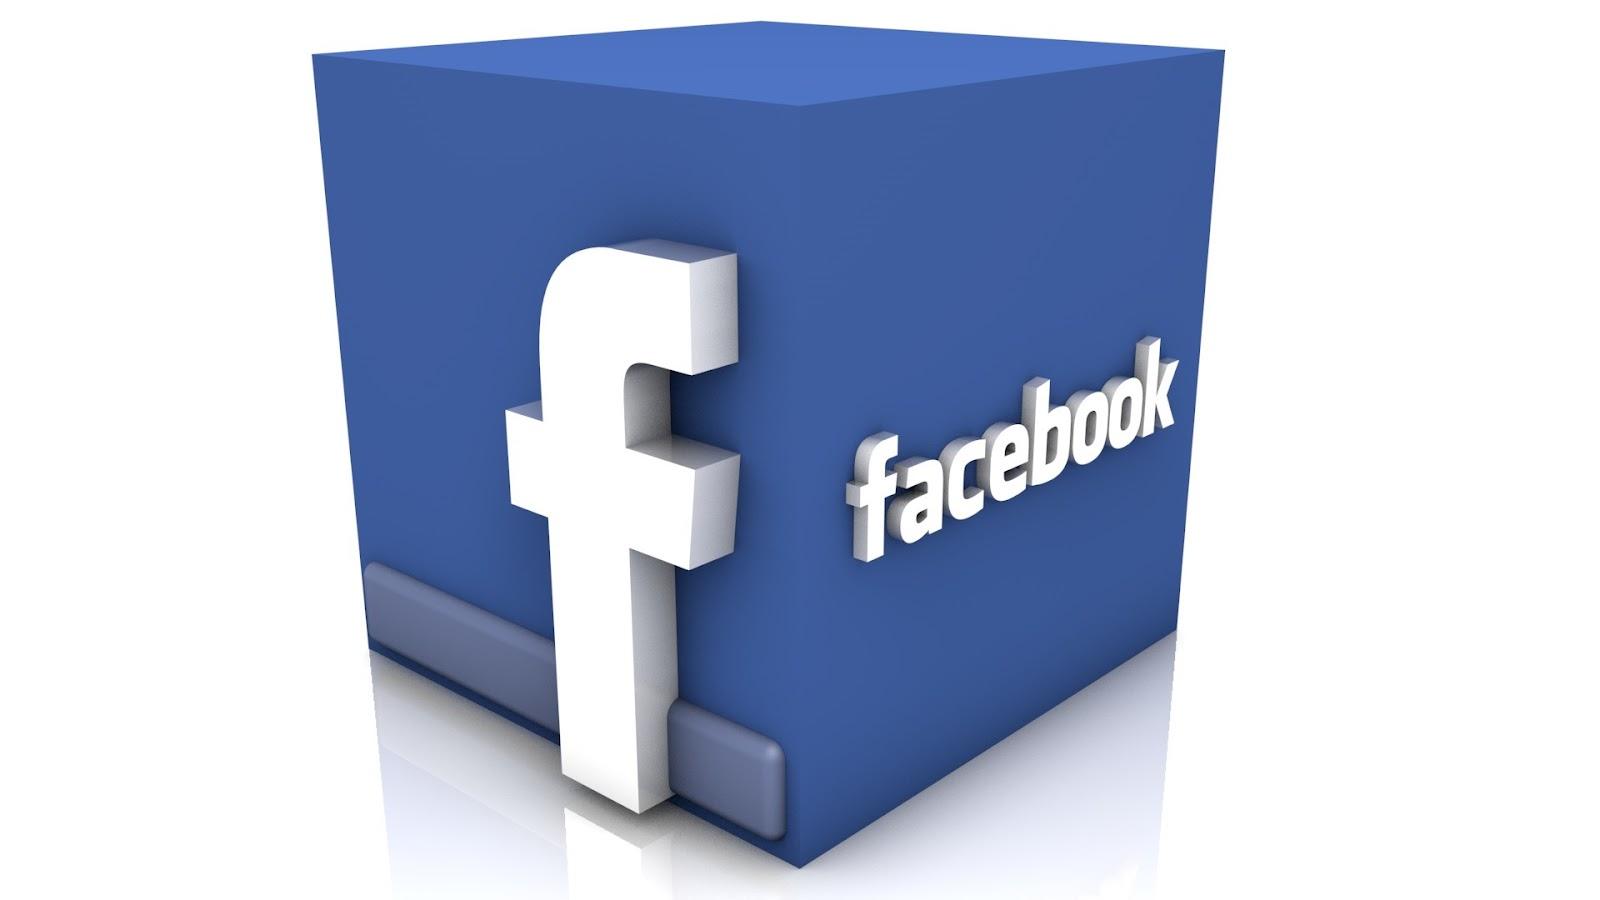 facebook_cube